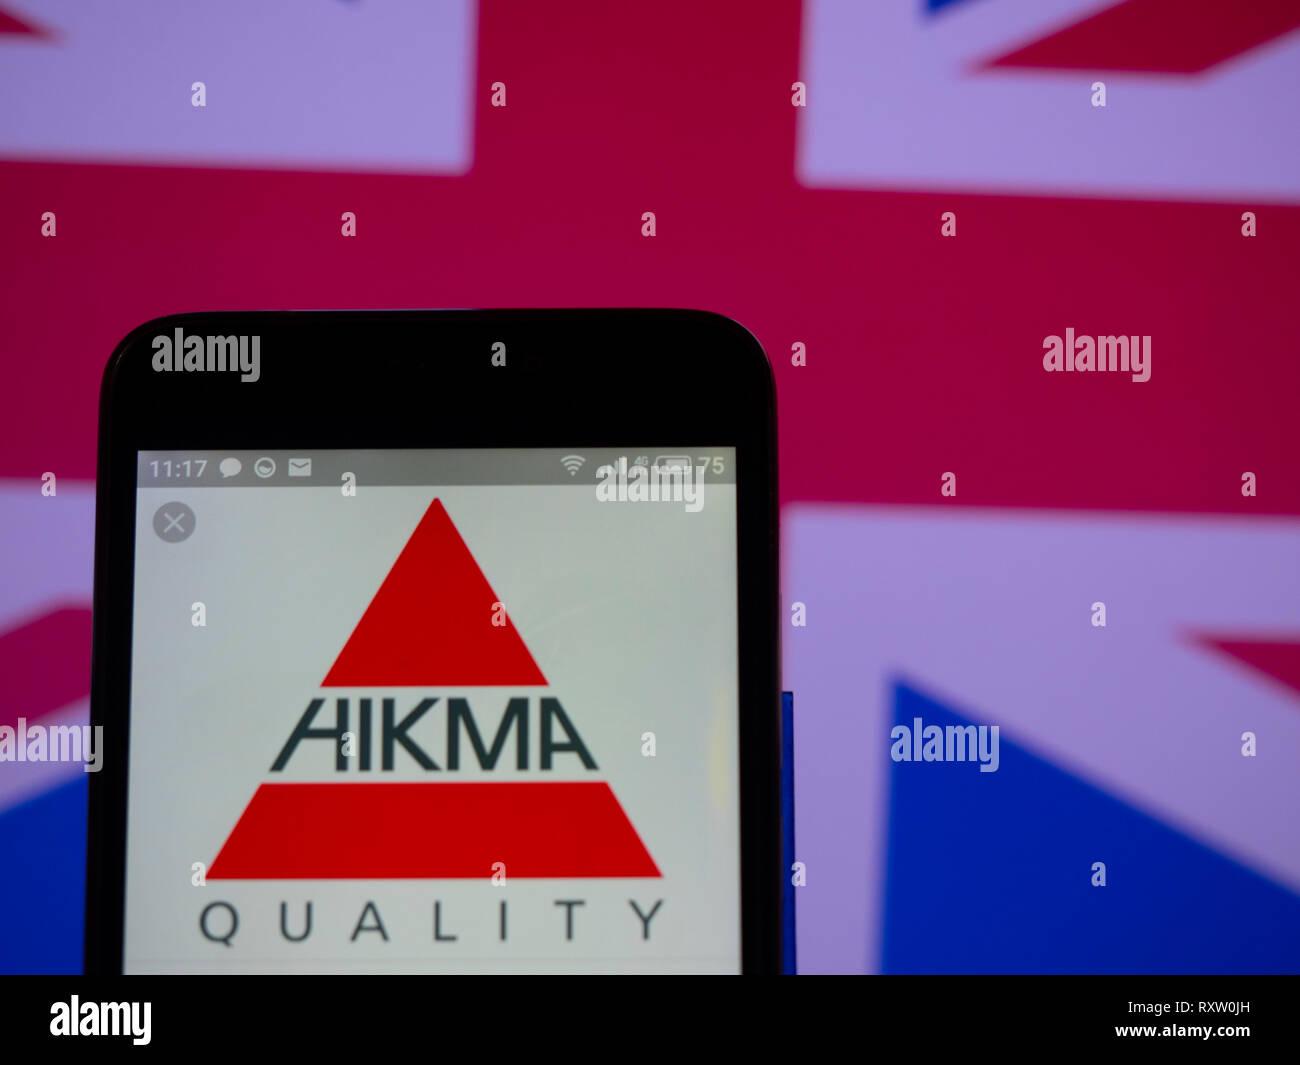 Hikma Pharmaceuticals company logo seen displayed on smart